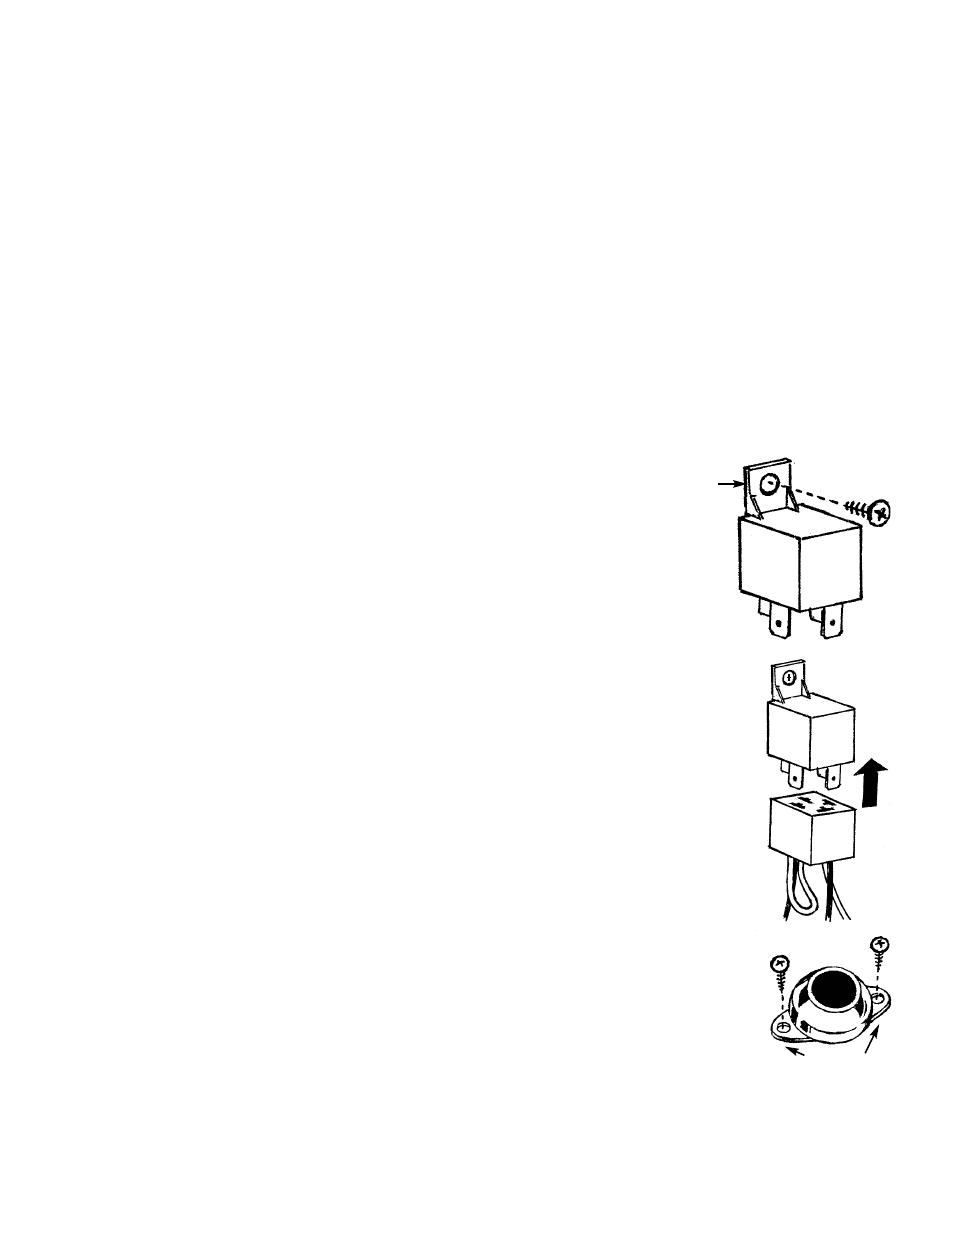 medium resolution of wolo hwk 1 air horn wiring kit user manual